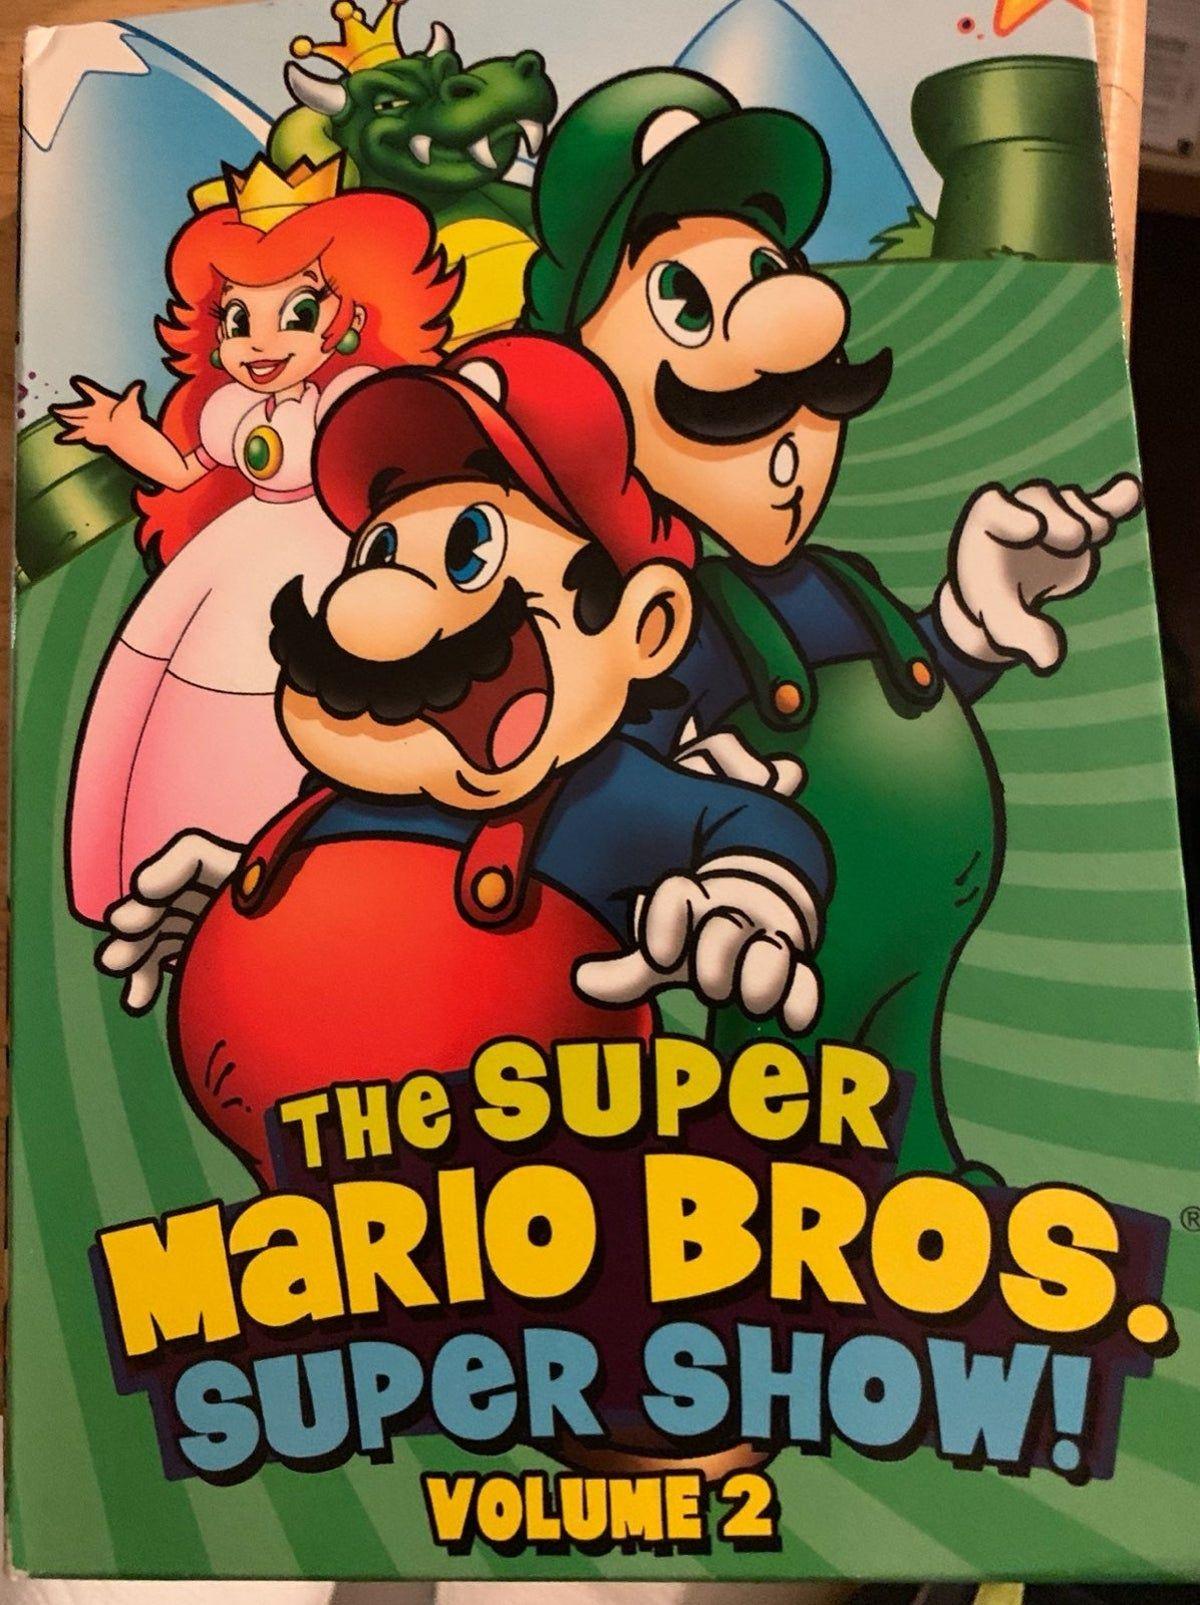 1989 Rare Super Mario Bros Super Show V2 In 2020 Super Mario